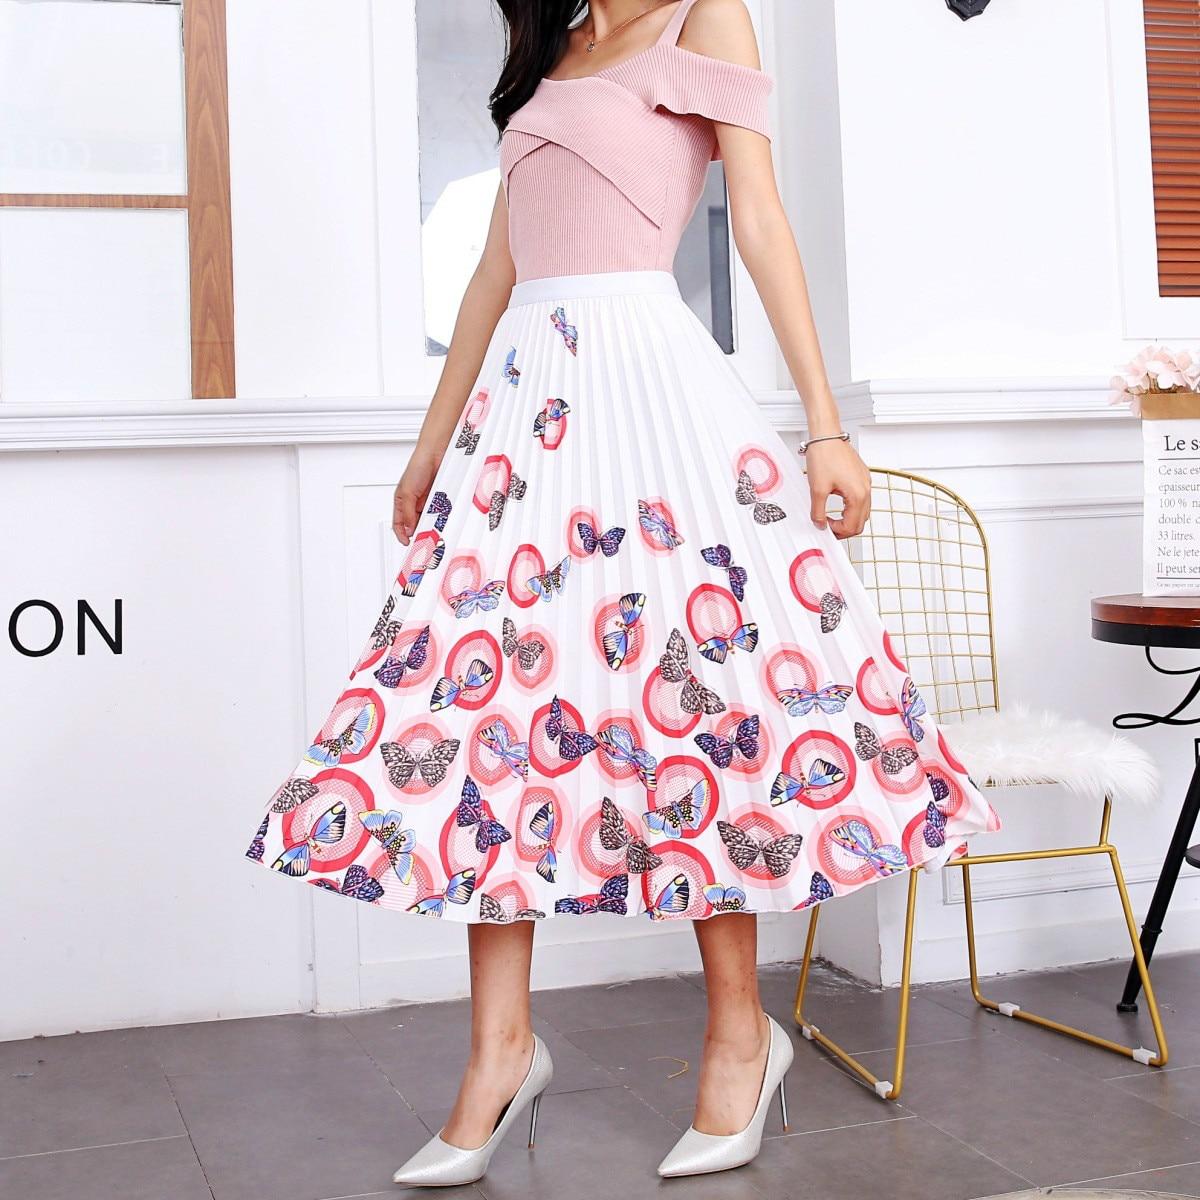 2020 New Summer Skirts Womens Butterfly Catroon Print Empire High Waist Elastci Pleated Midi Skirt European High Street Style 8